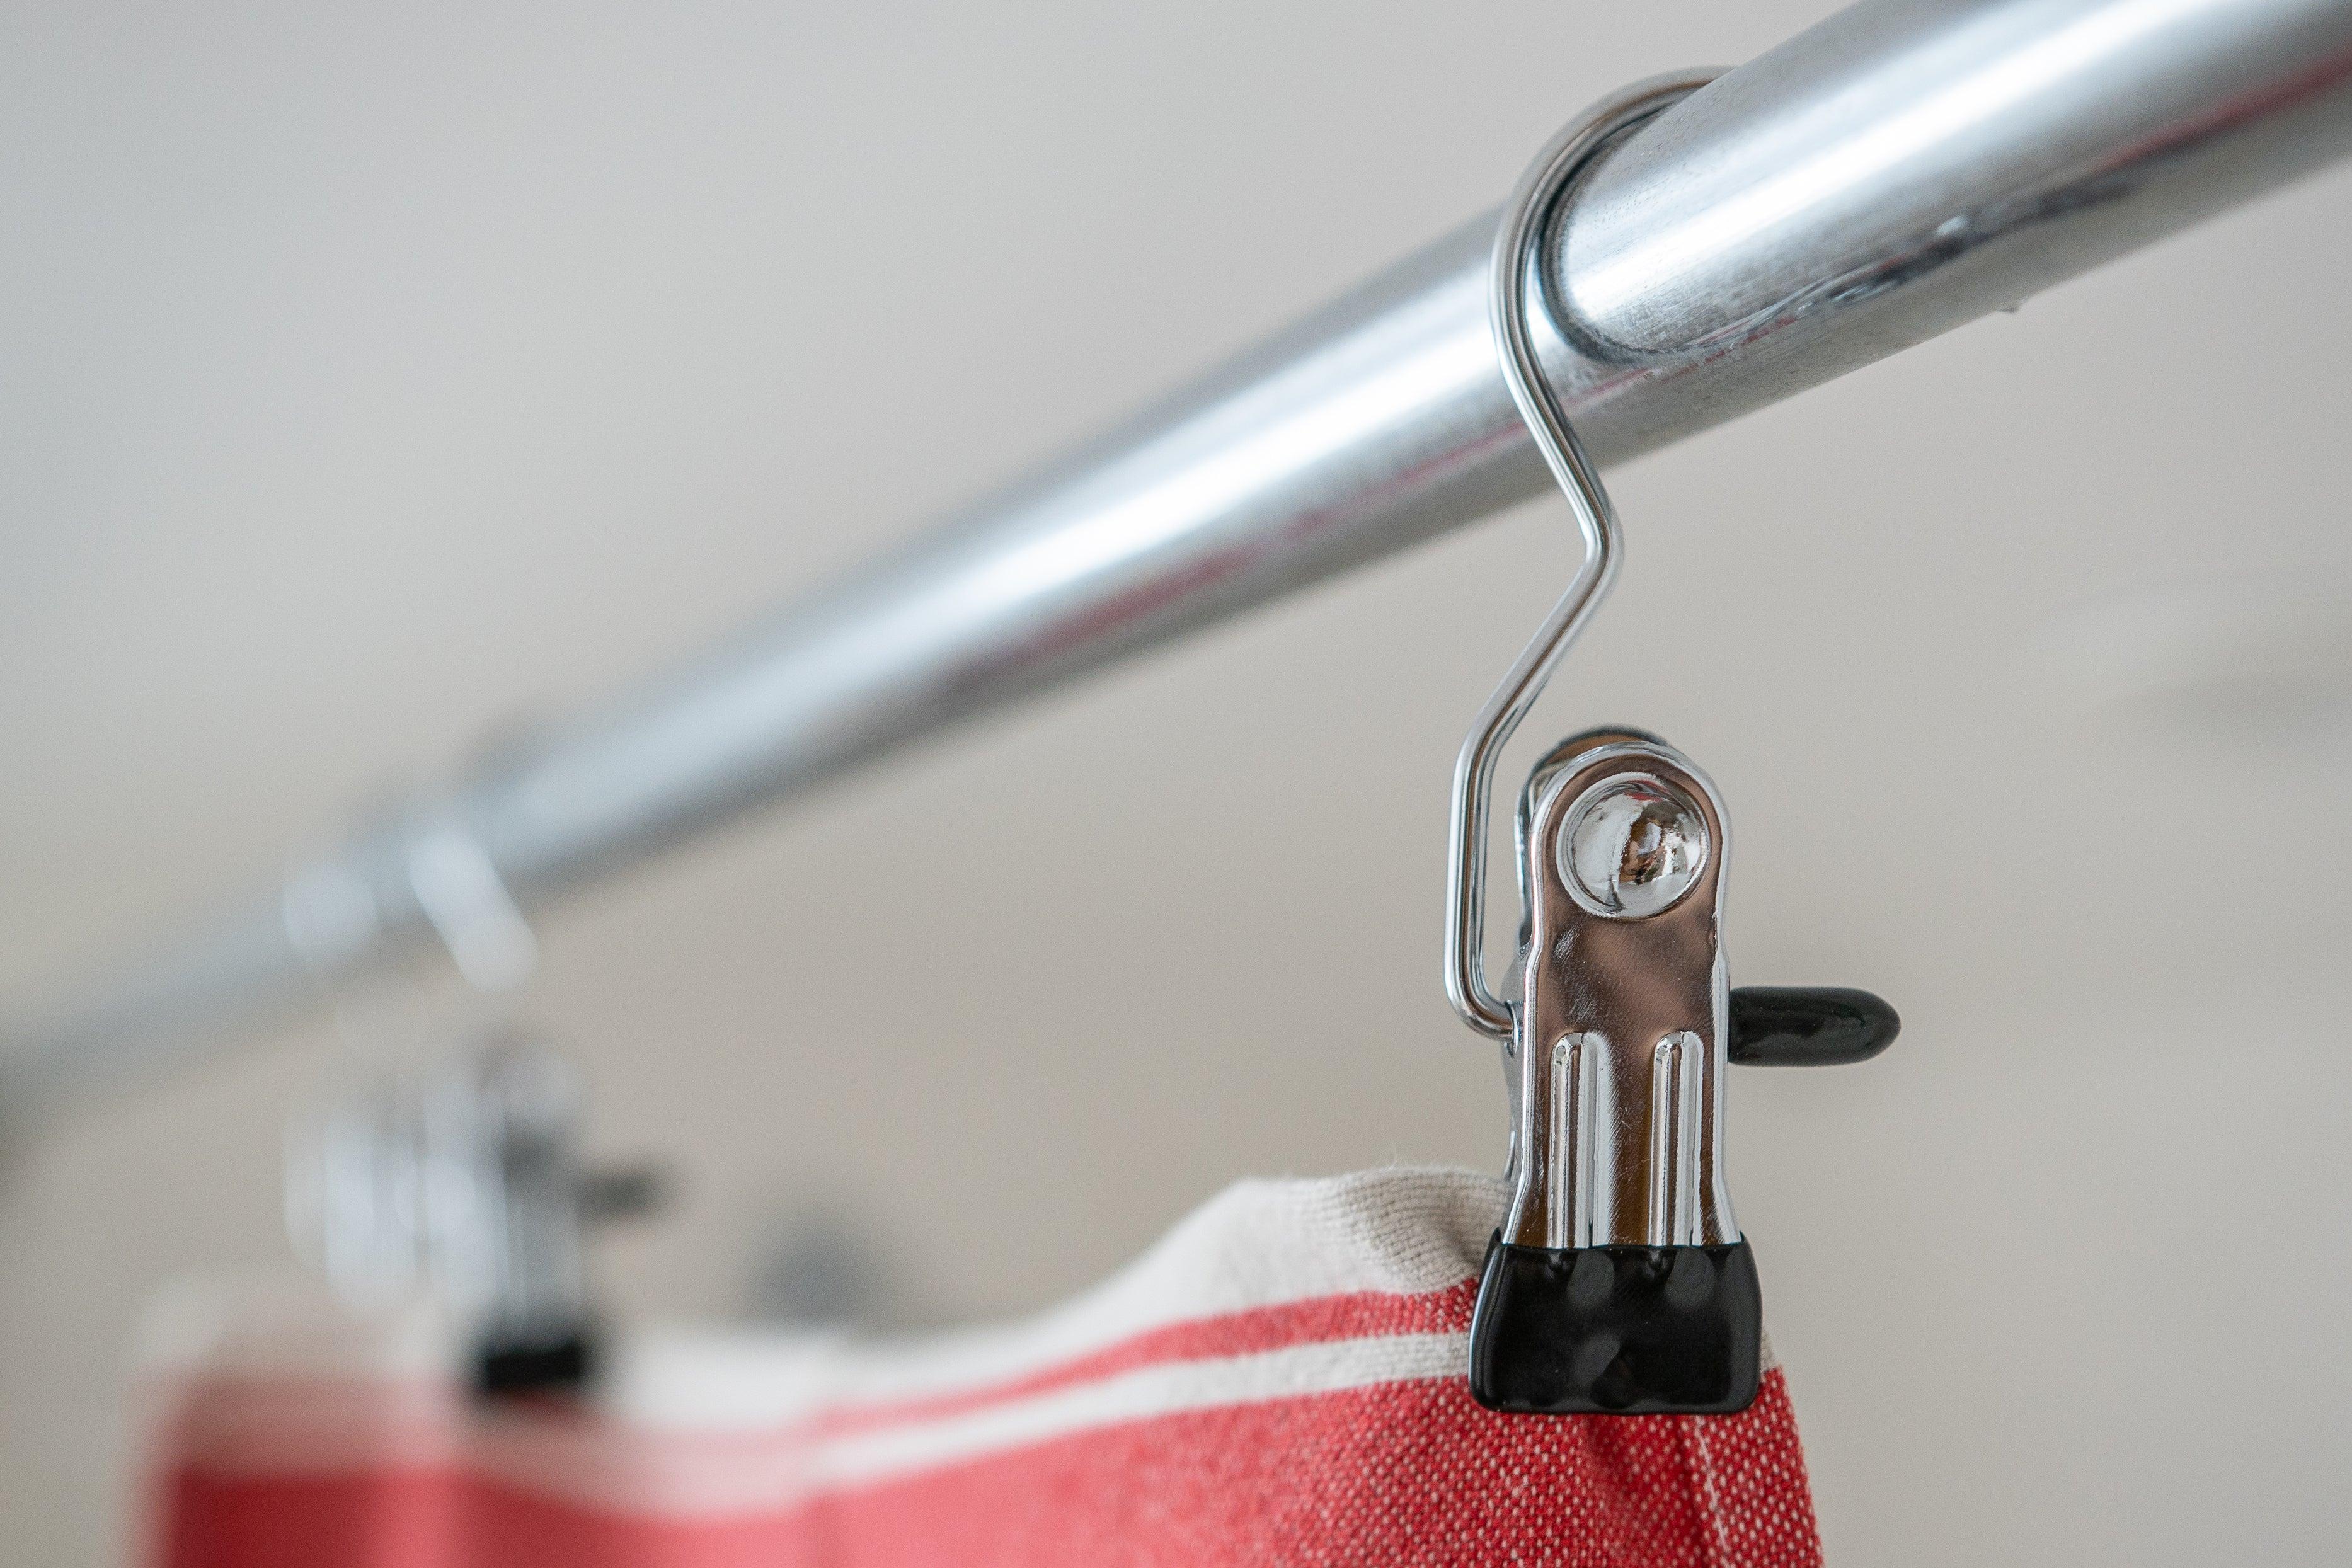 Ipow Laundry Clips